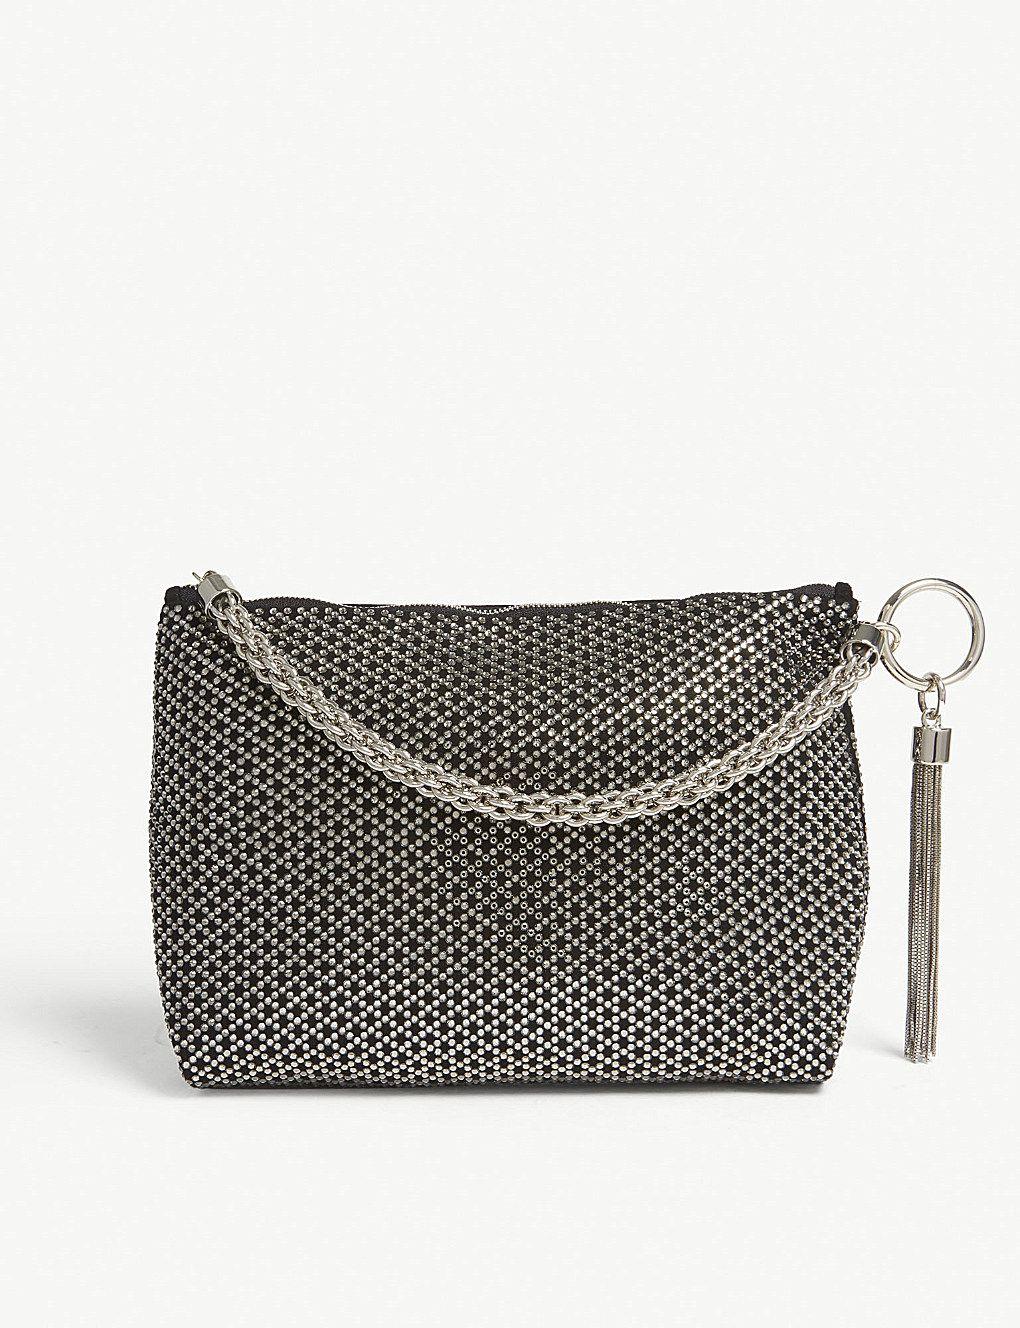 1409b685cb JIMMY CHOO - Callie metallic suede pouch | Selfridges. | Bag it ...